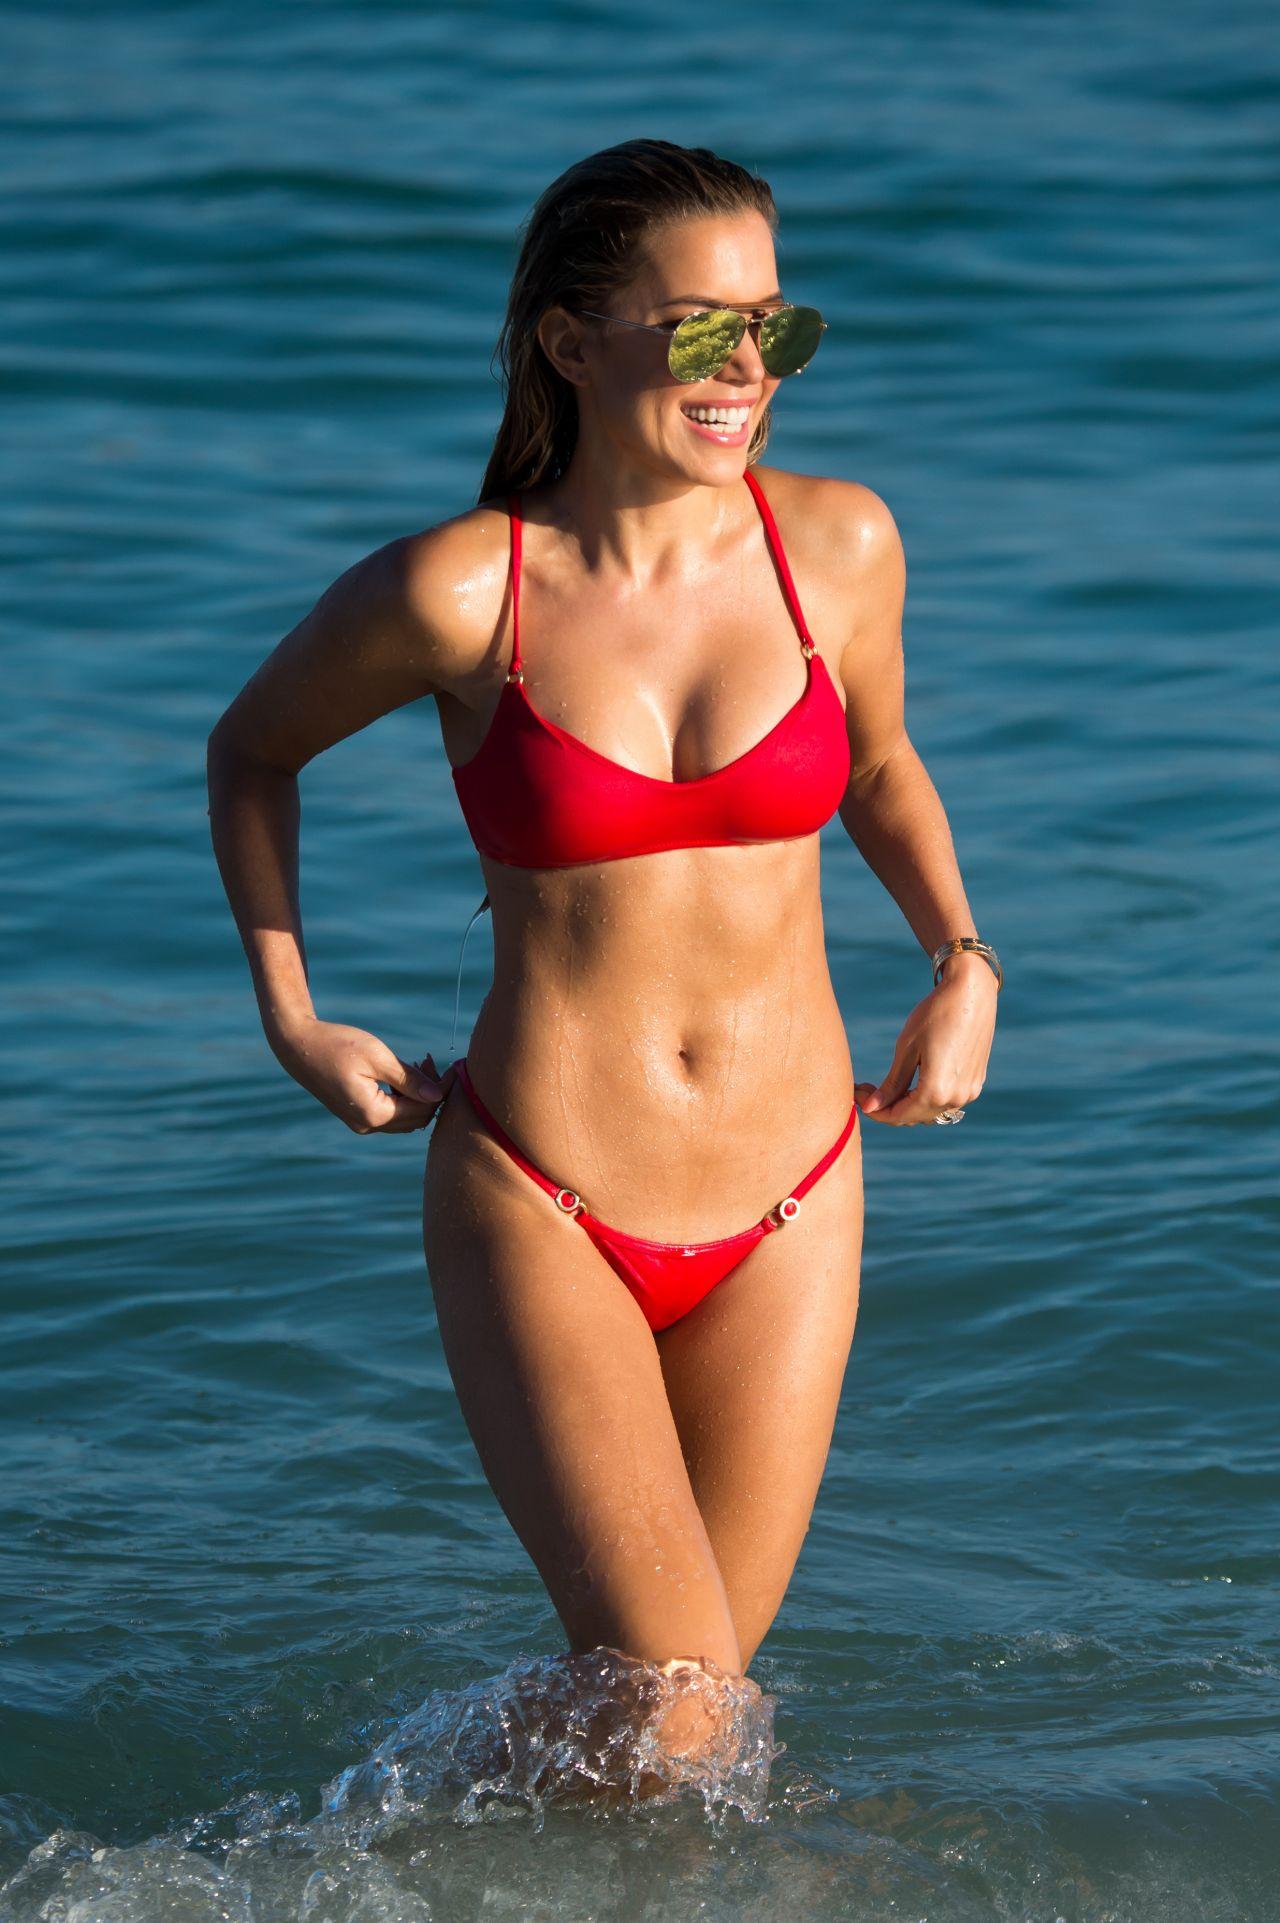 c00cfa8c723 Sylvie Meis in a Red Bikini on the Beach in Miami